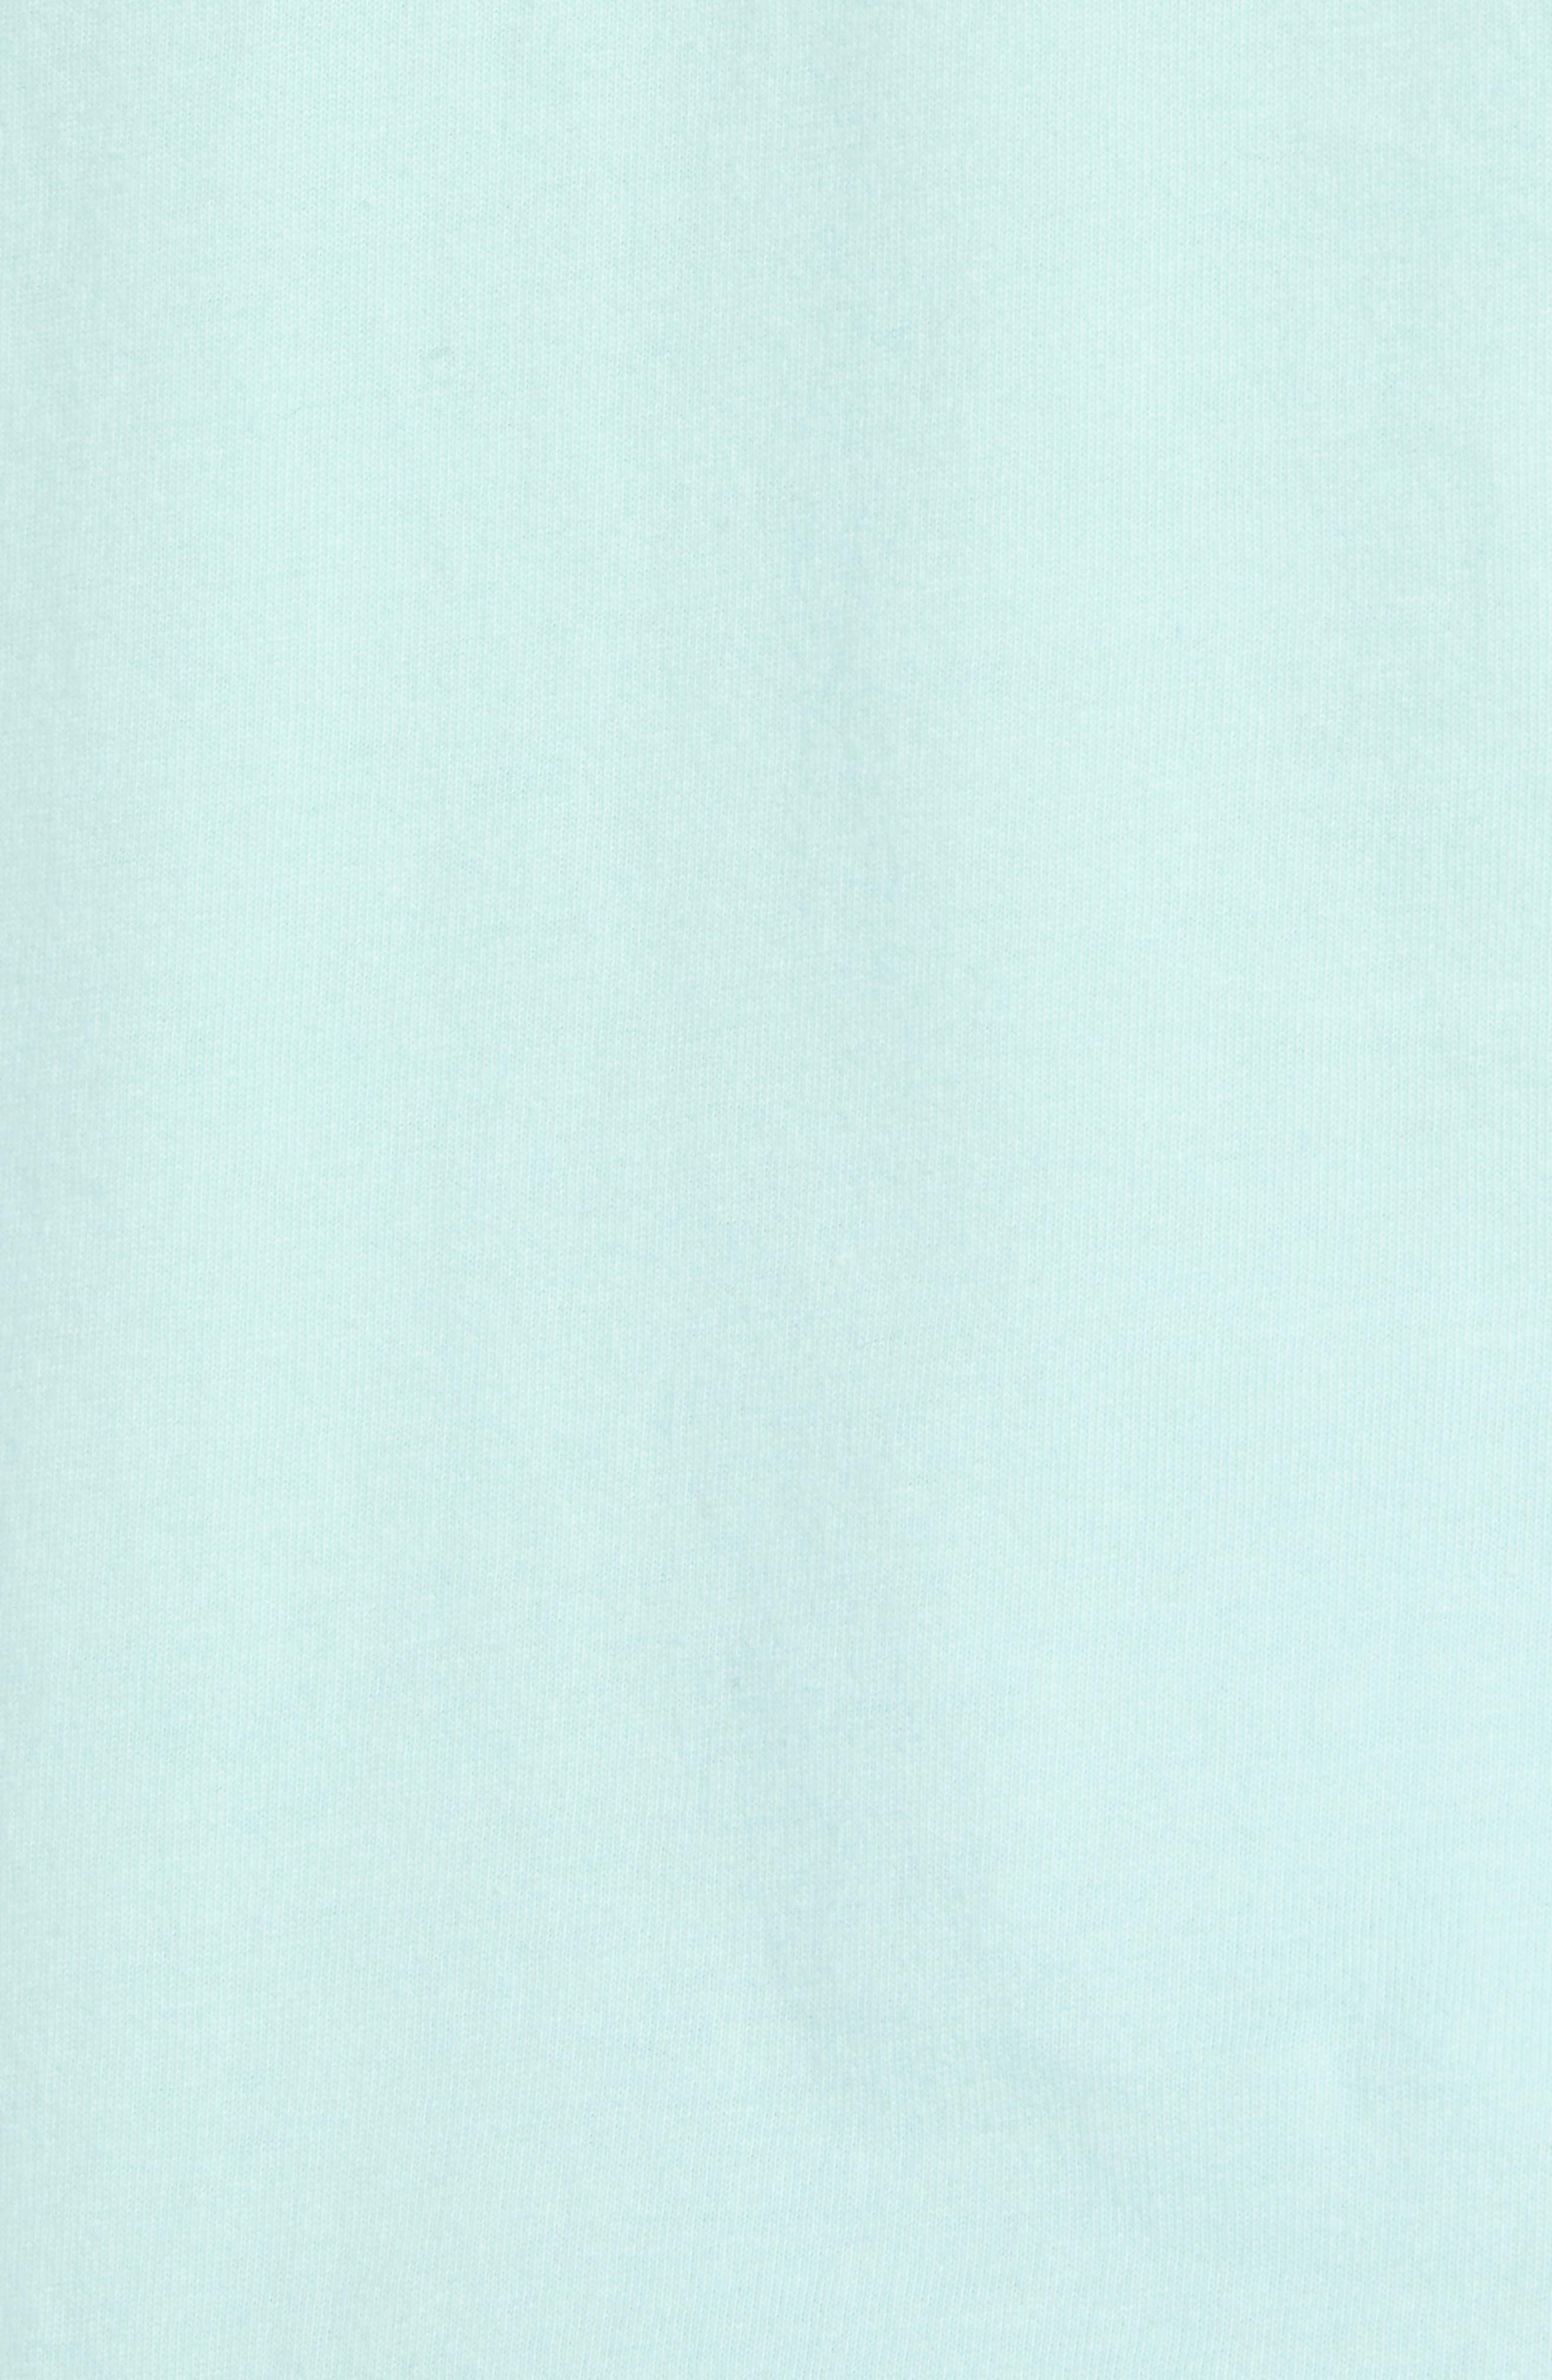 Fly Fishing Regular Fit Pocket T-Shirt,                             Alternate thumbnail 5, color,                             376